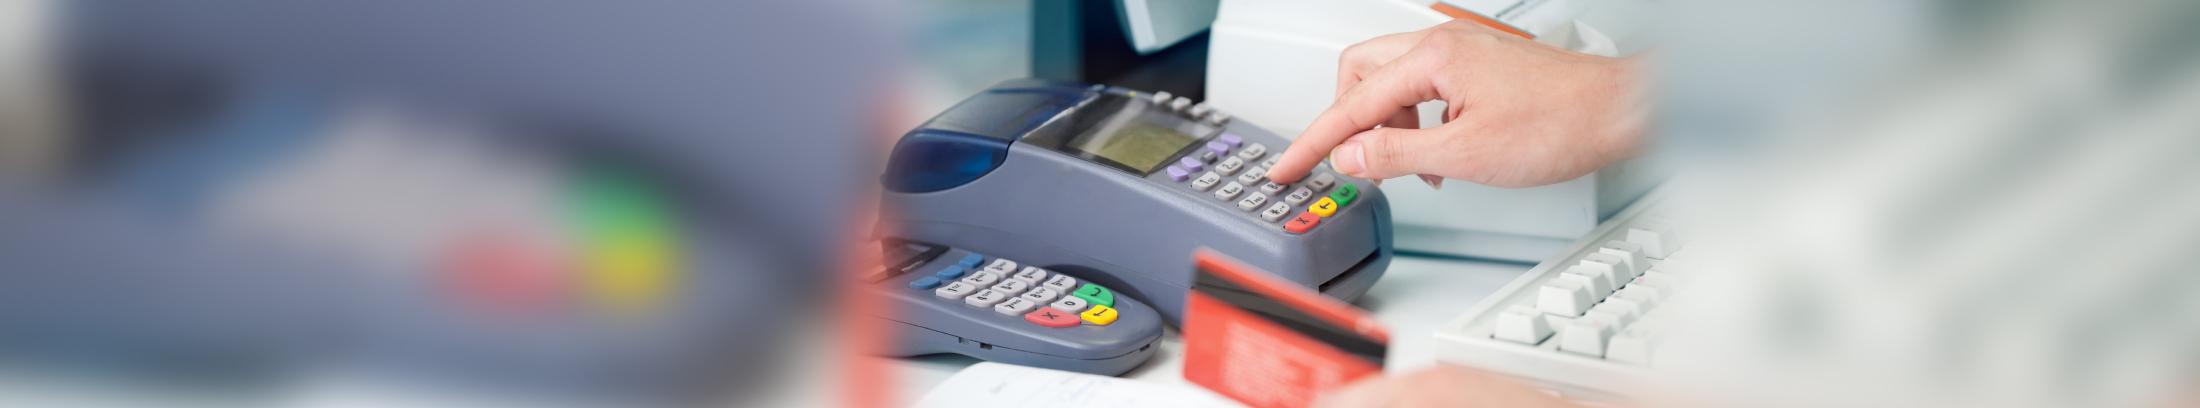 Online Cheap Mobile Debit Amp Credit Card Processing Merchant